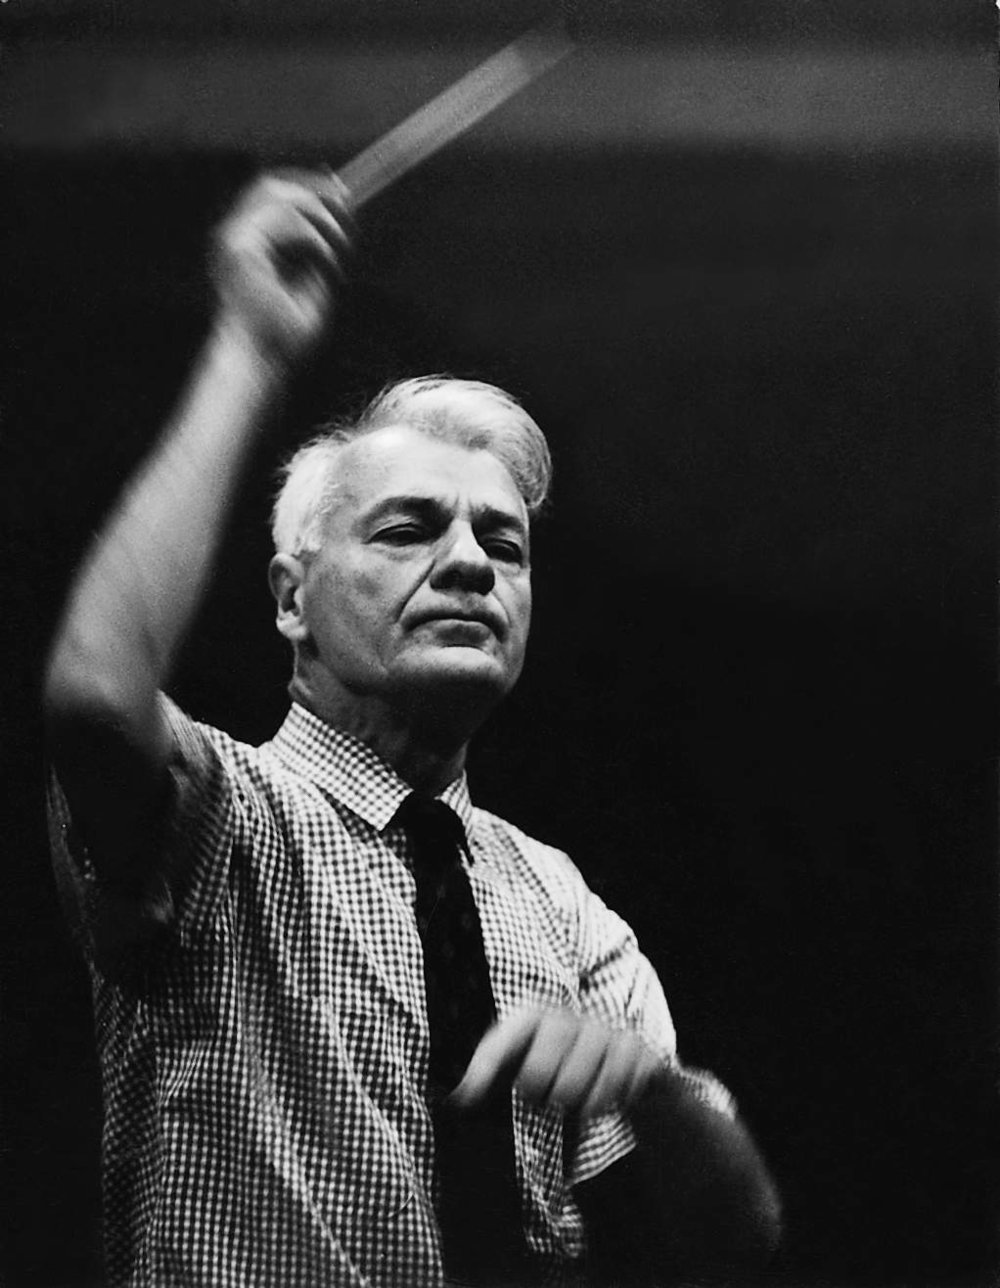 Tibor Serly